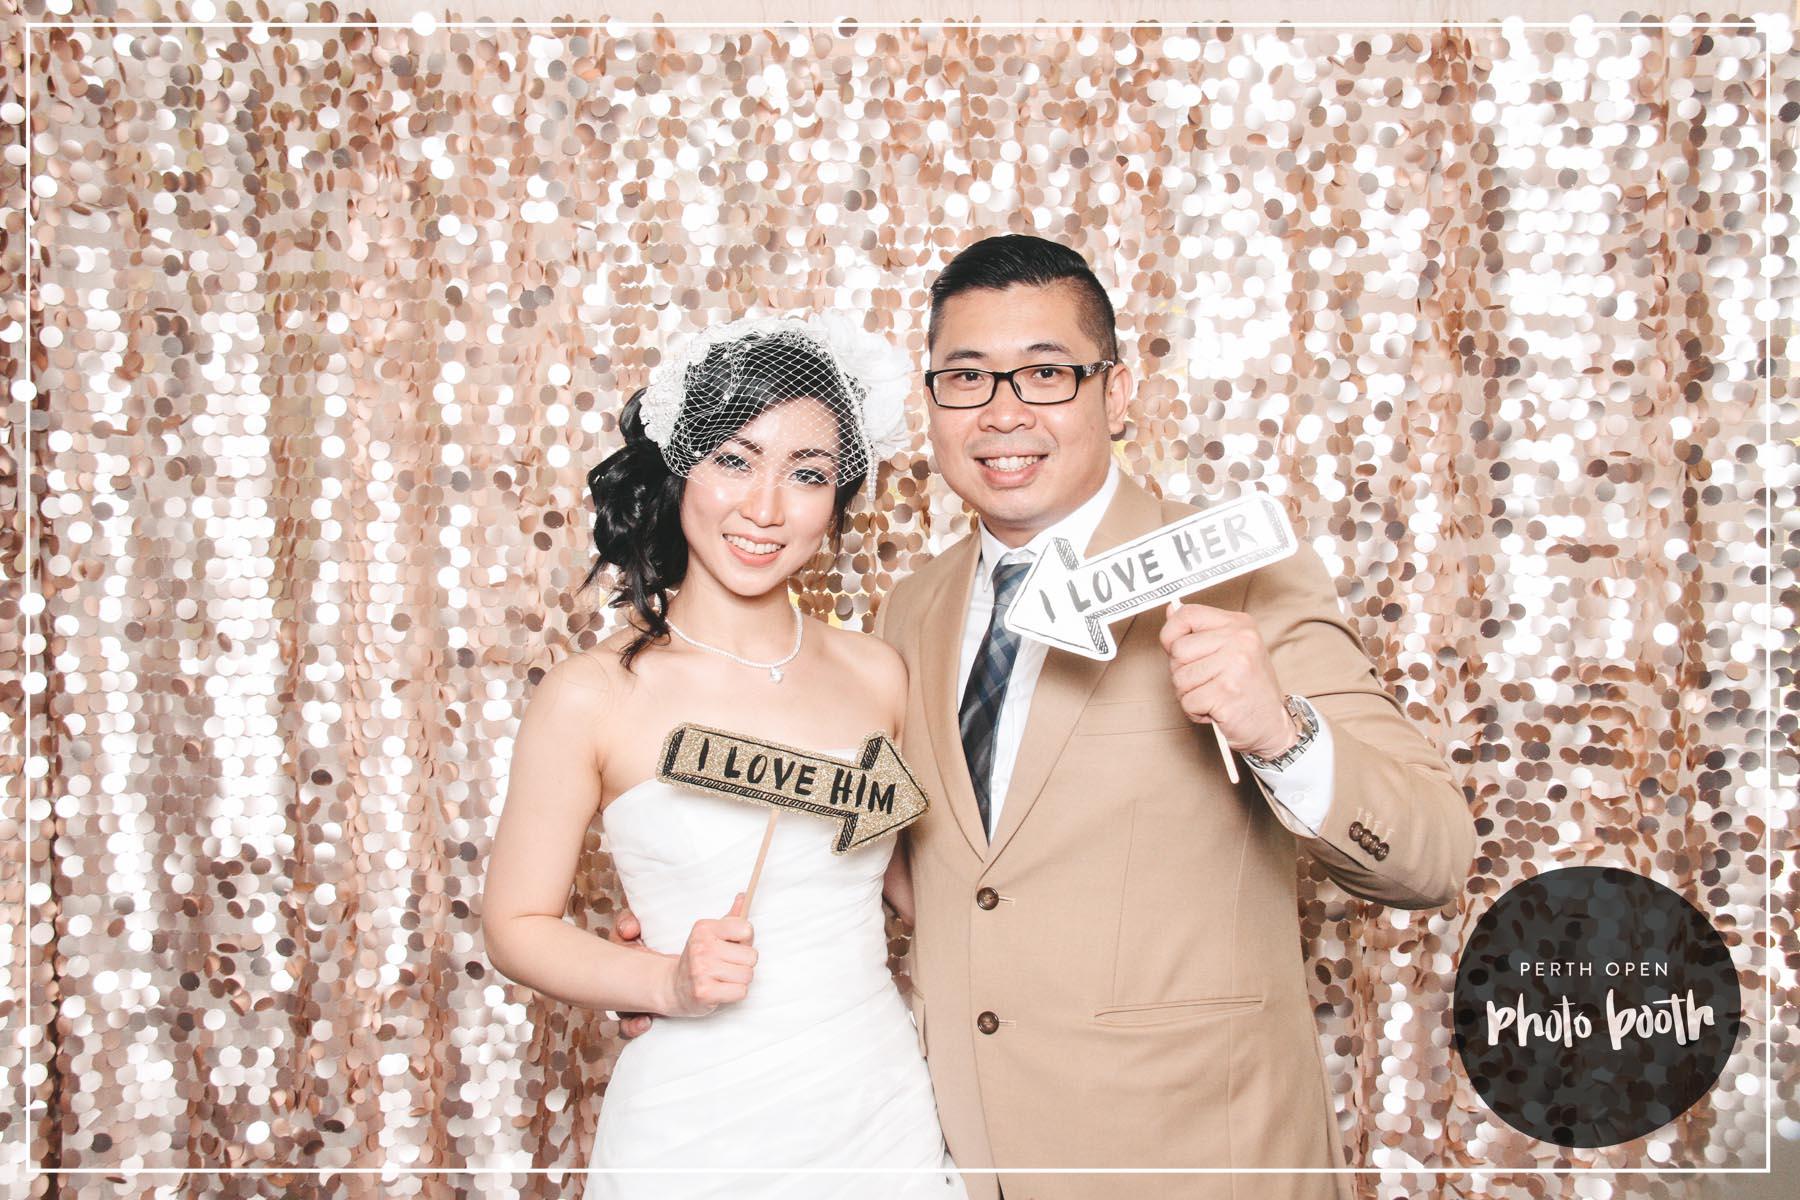 Raymond & Nessya's Wedding  Password: Provided on the day   - all lowercase -